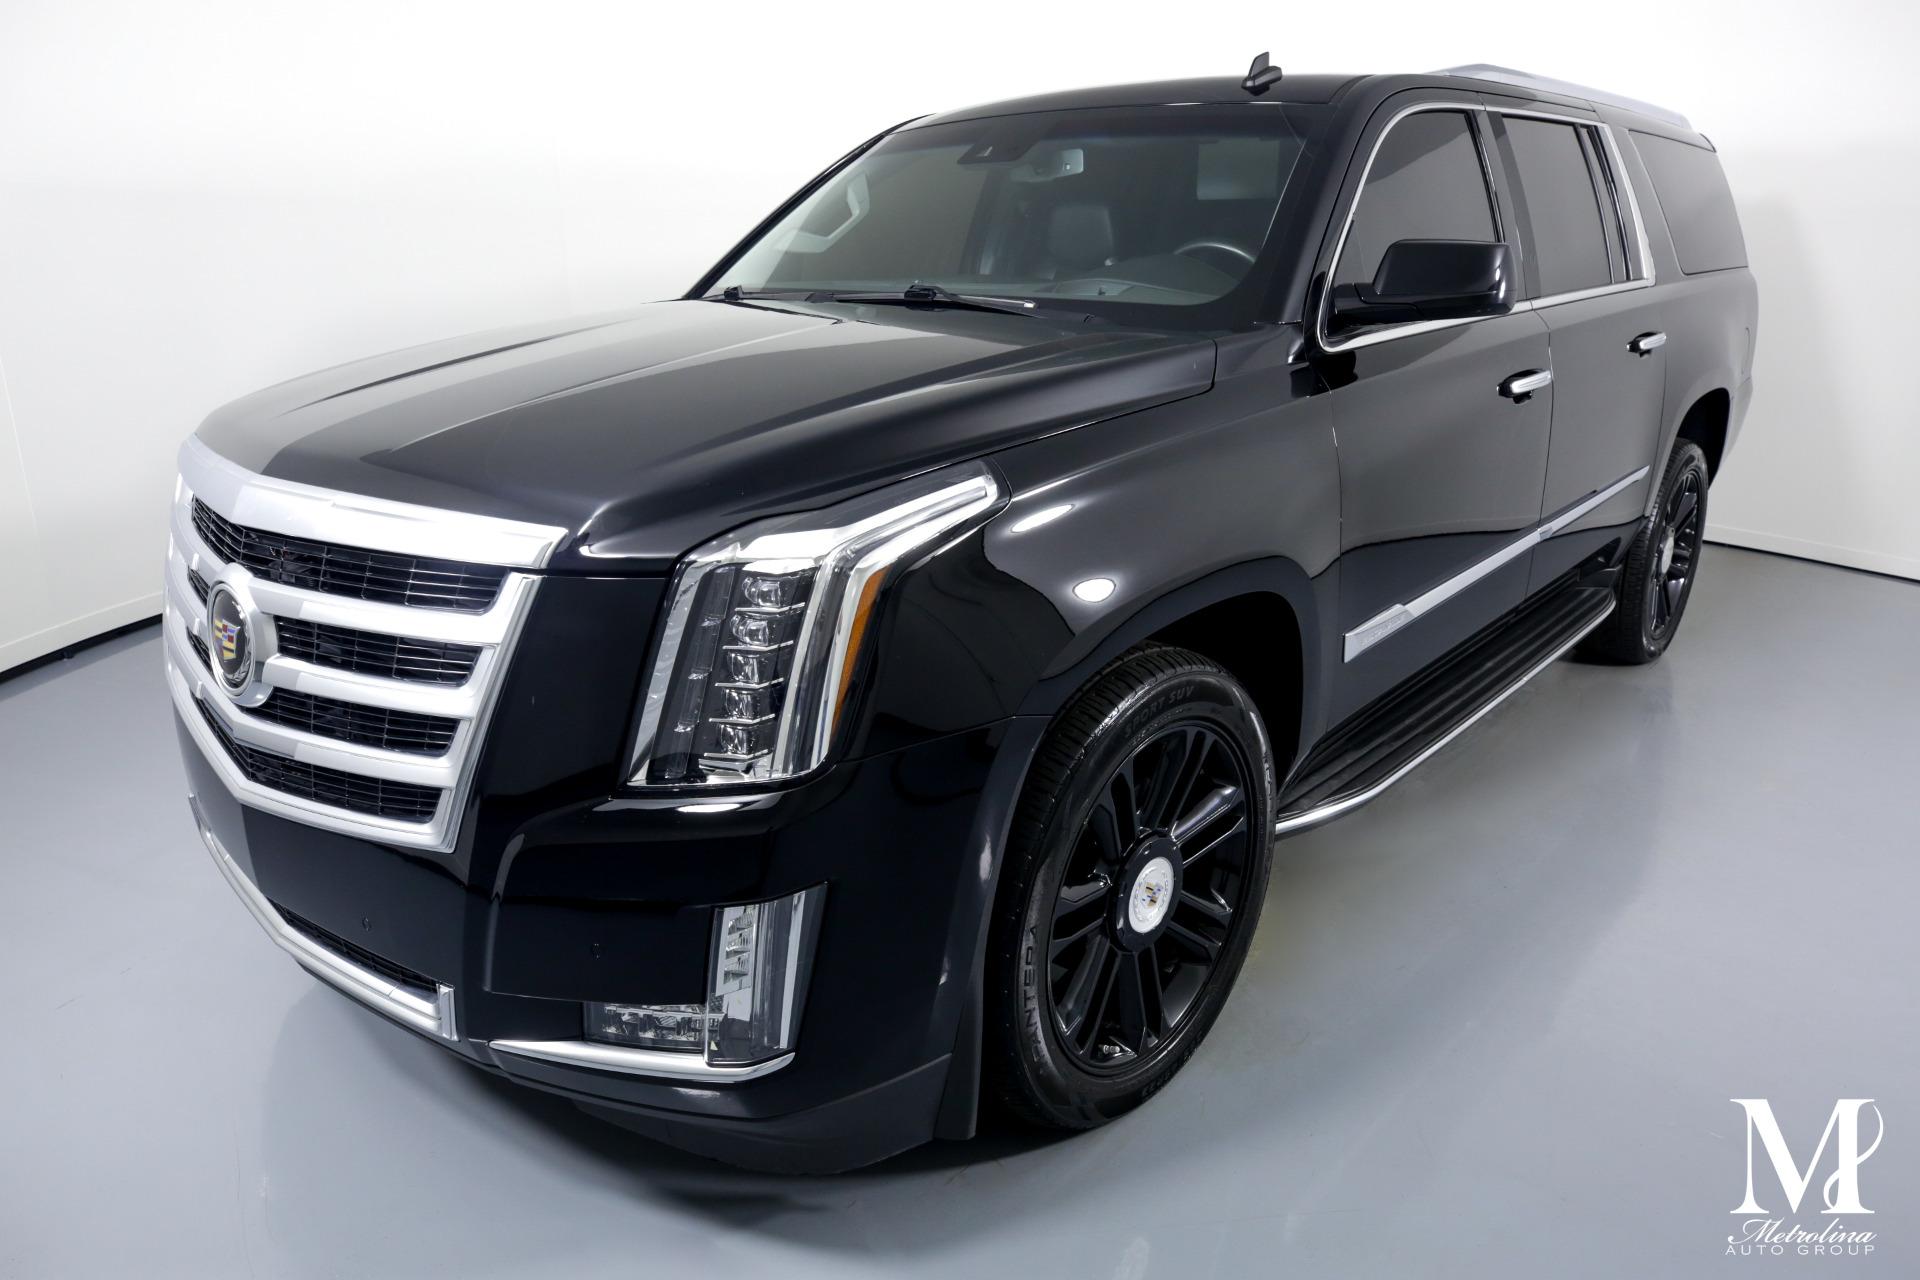 Used 2015 Cadillac Escalade ESV Premium for sale $59,996 at Metrolina Auto Group in Charlotte NC 28217 - 4